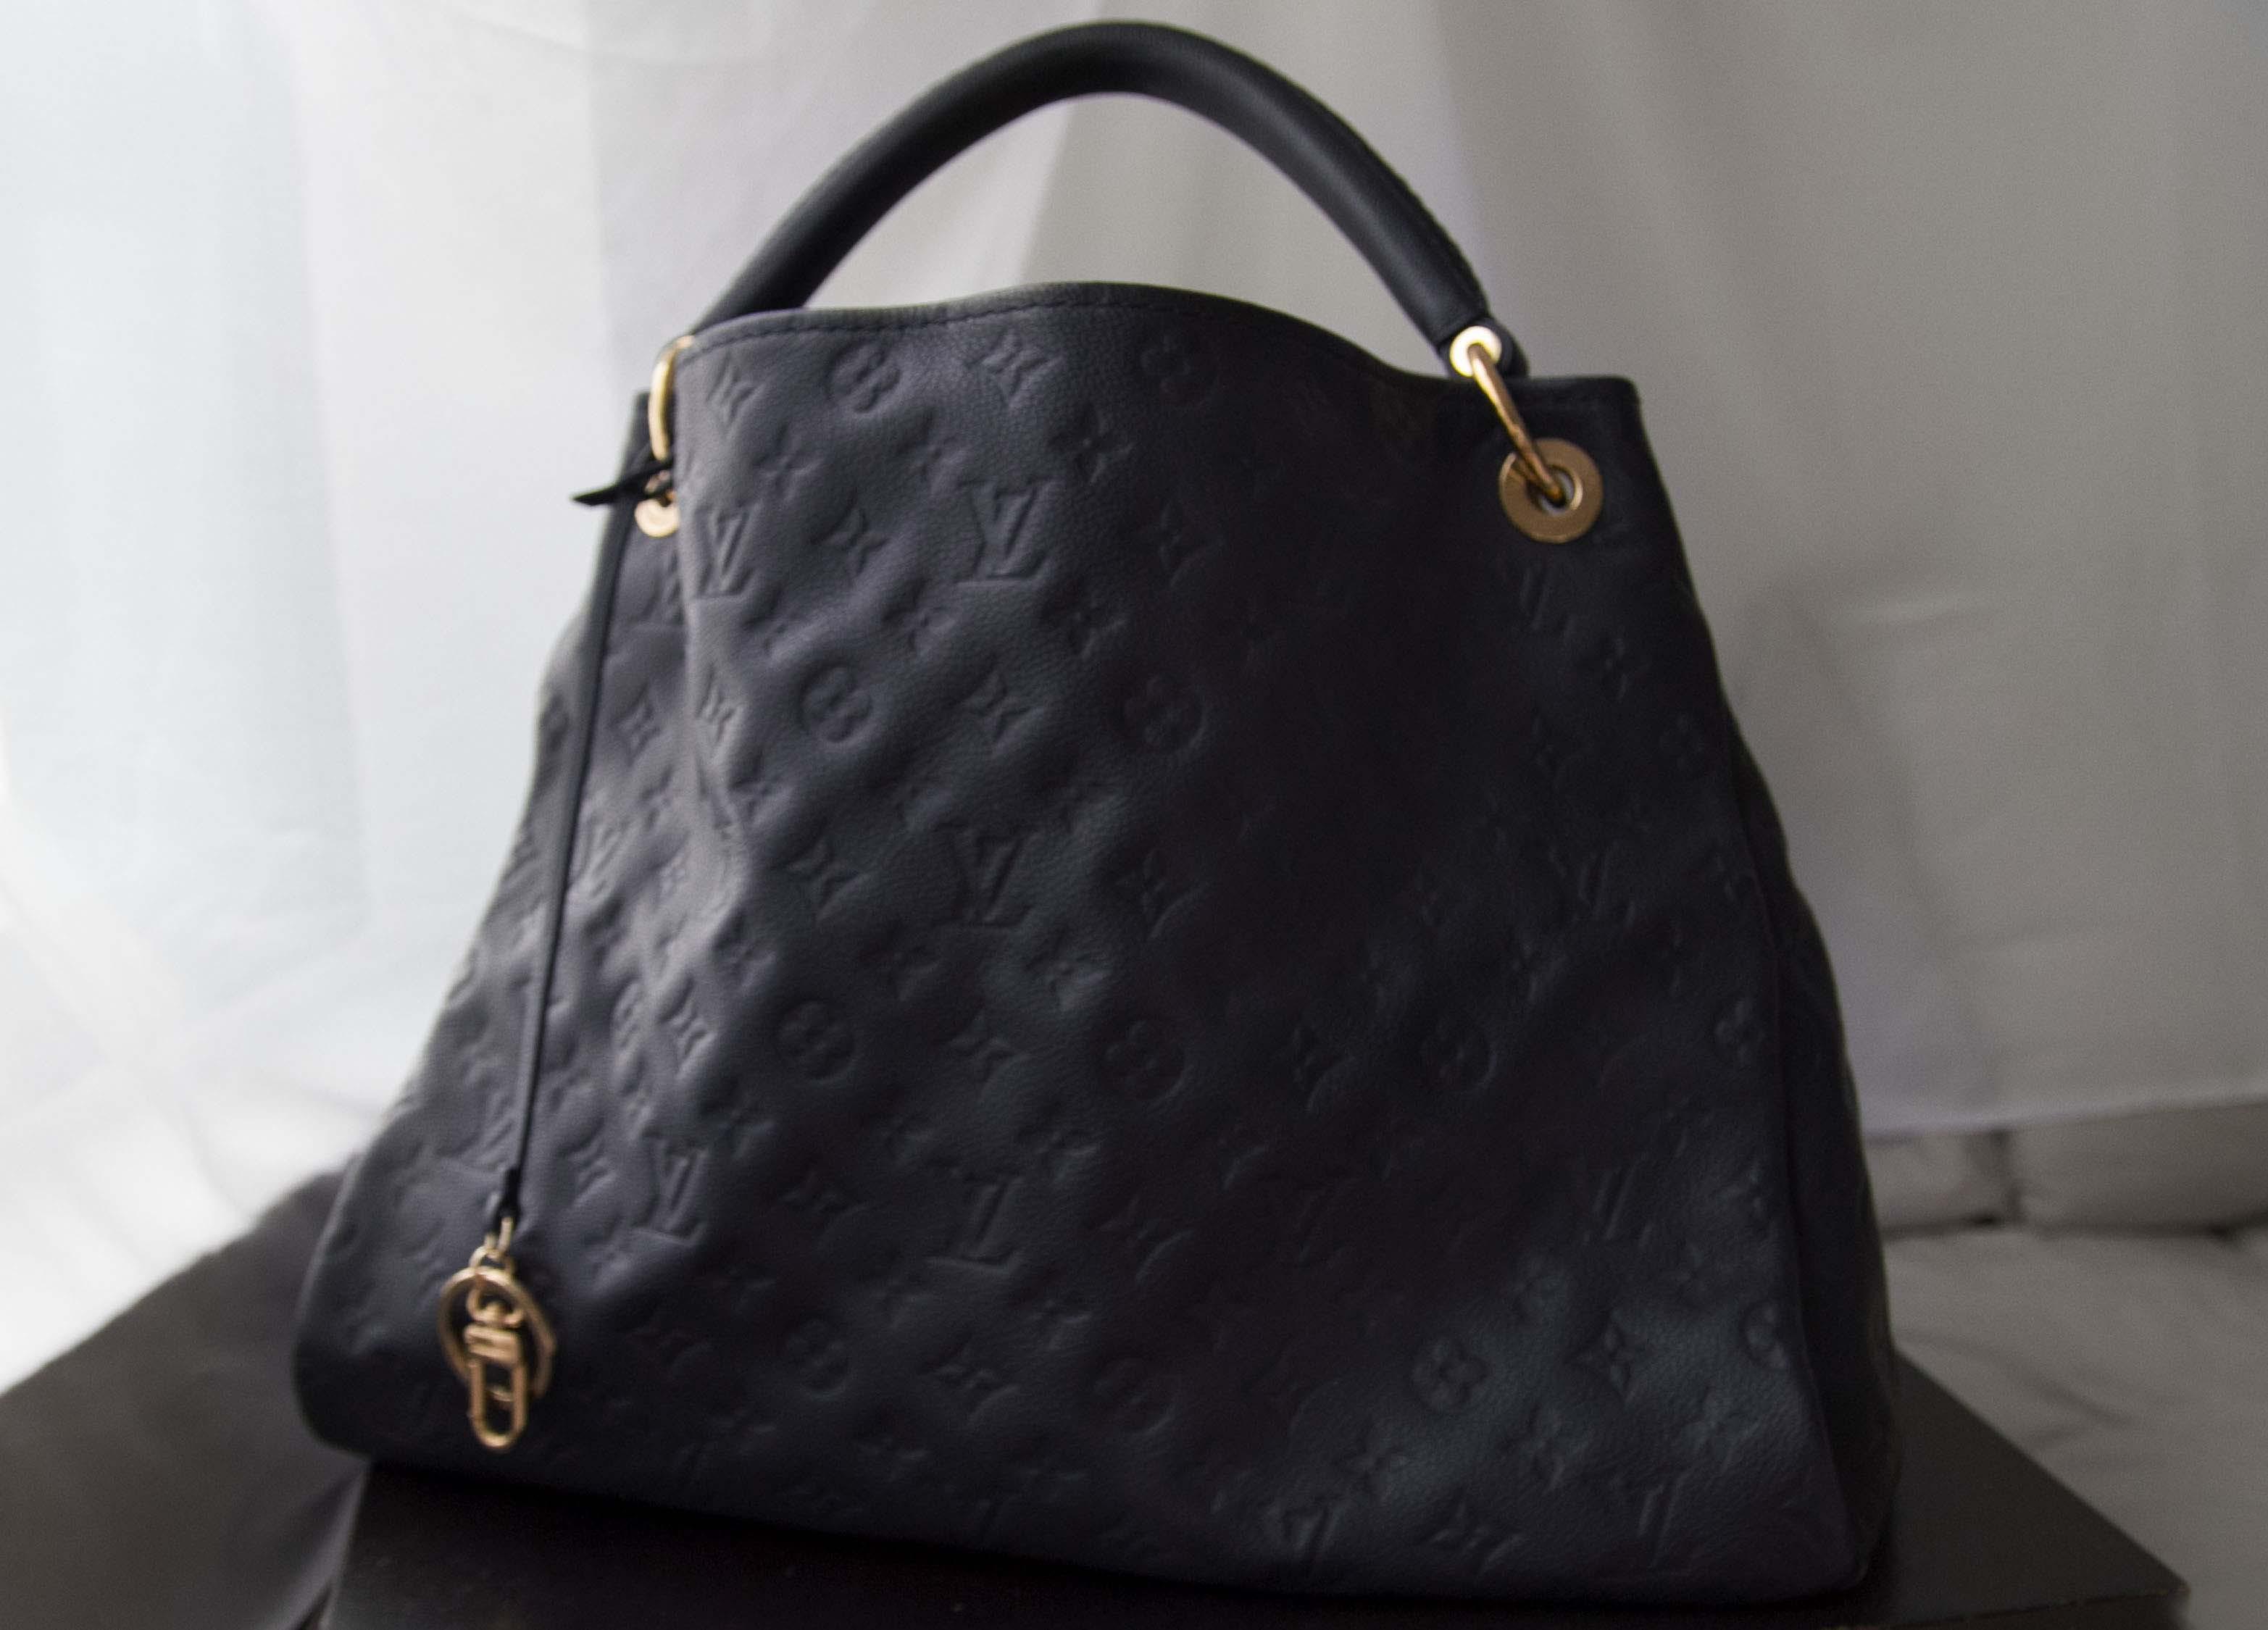 8d743f8fee33b Black Louis Vuitton Artsy Bag